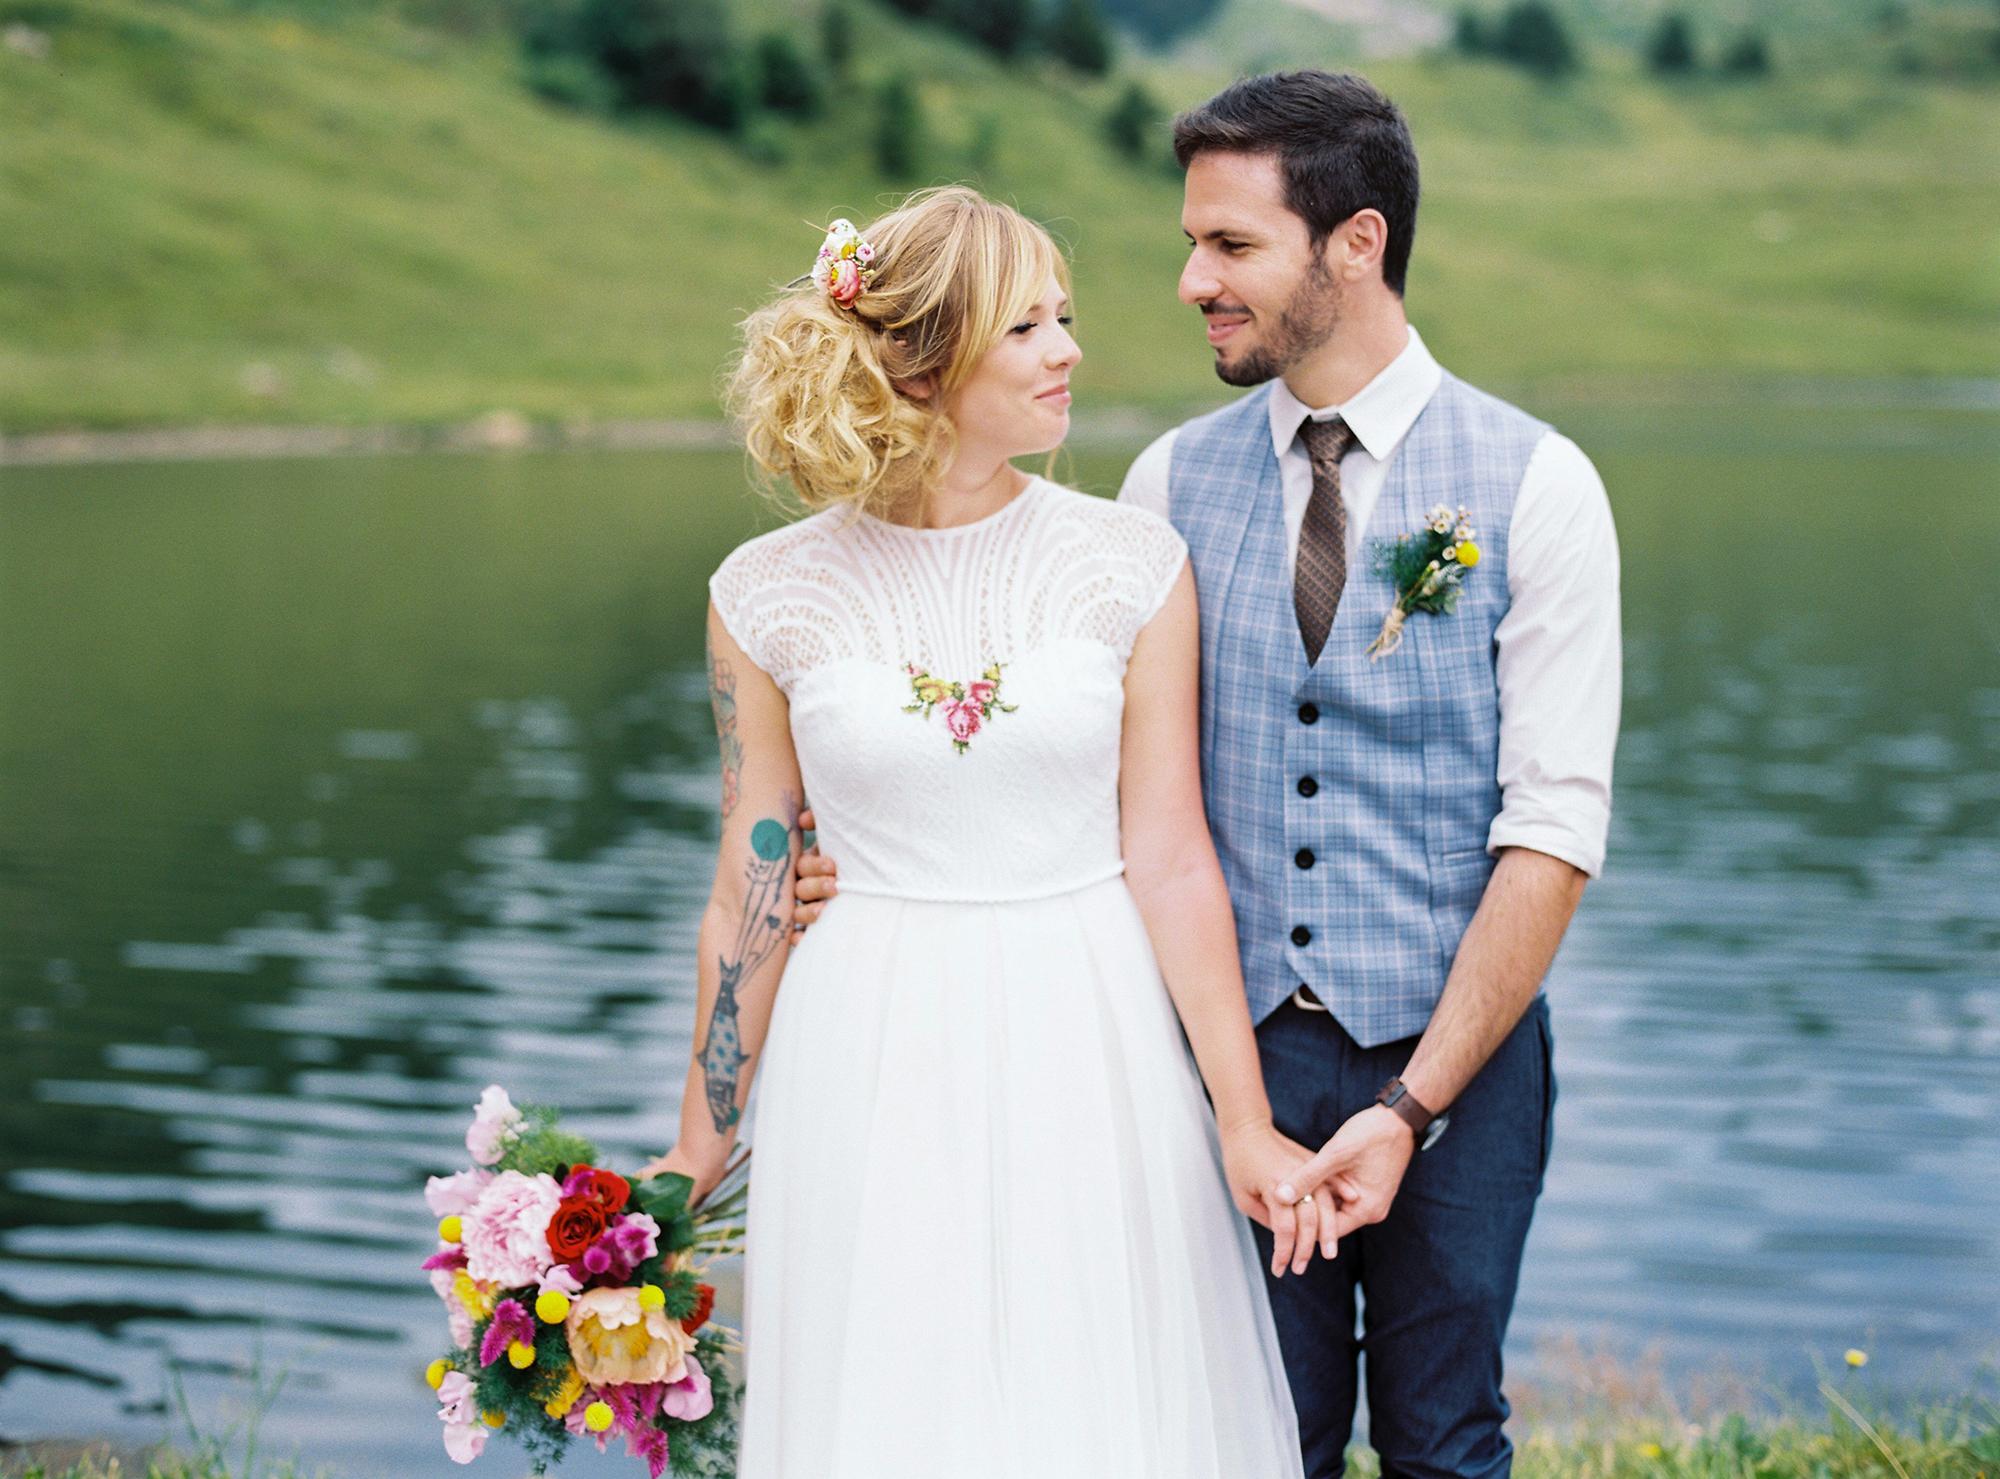 Mr and Mrs Shaul 302.jpg